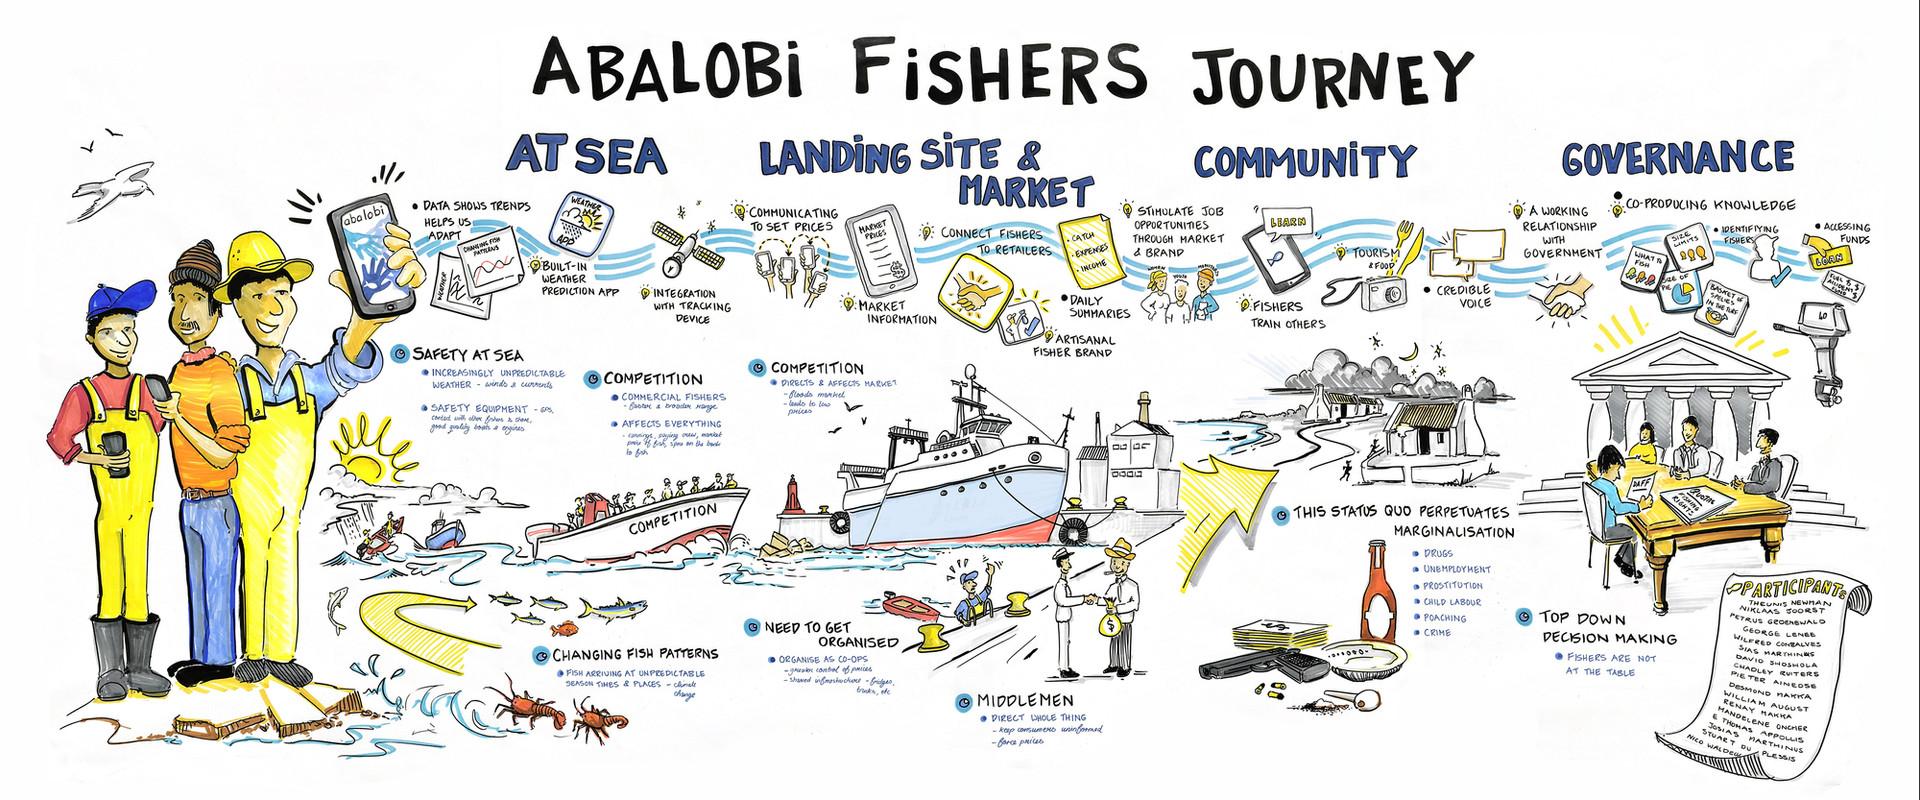 Abalobi App Development - Fishers' Journey